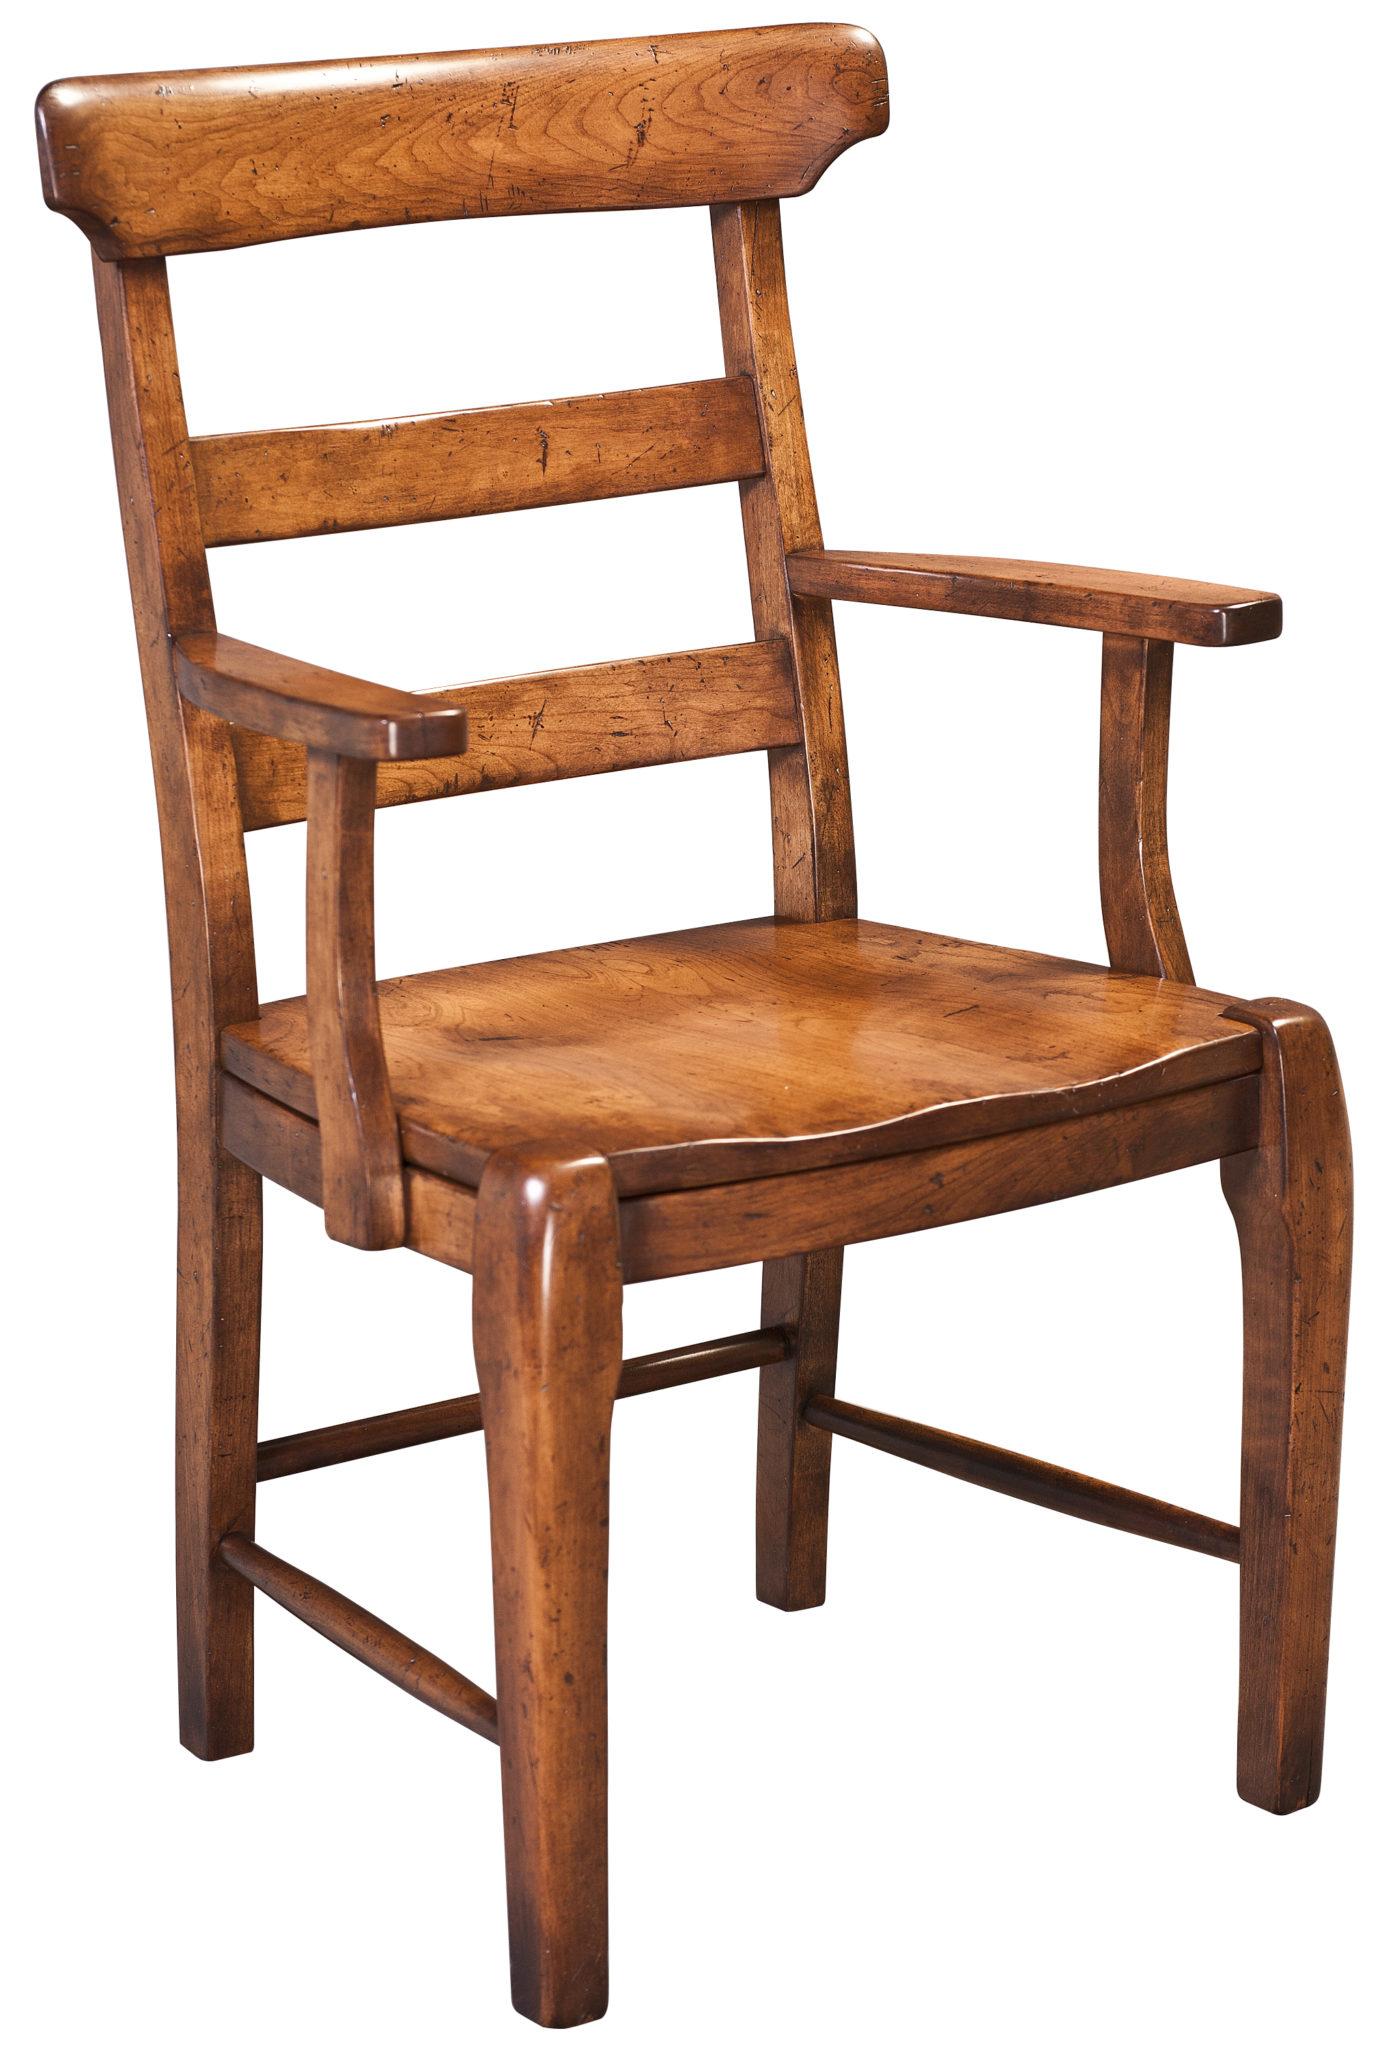 324AW-Yorkshire-Arm-Chair.jpg